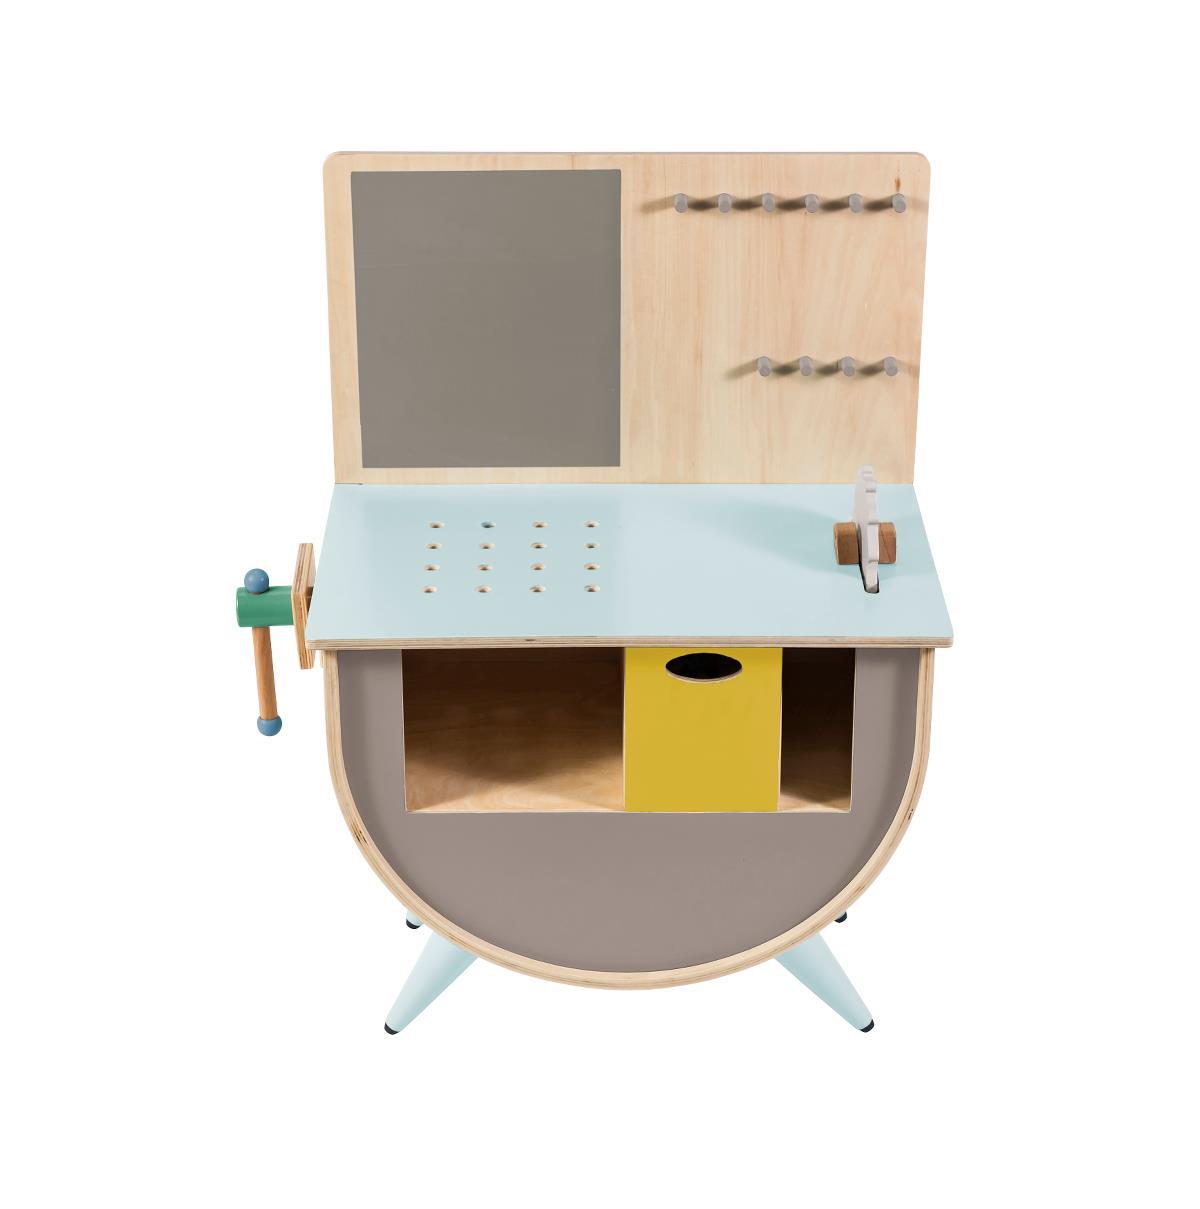 Sebra Spielzeug Werkbank Warmes Grau Kindermaxx